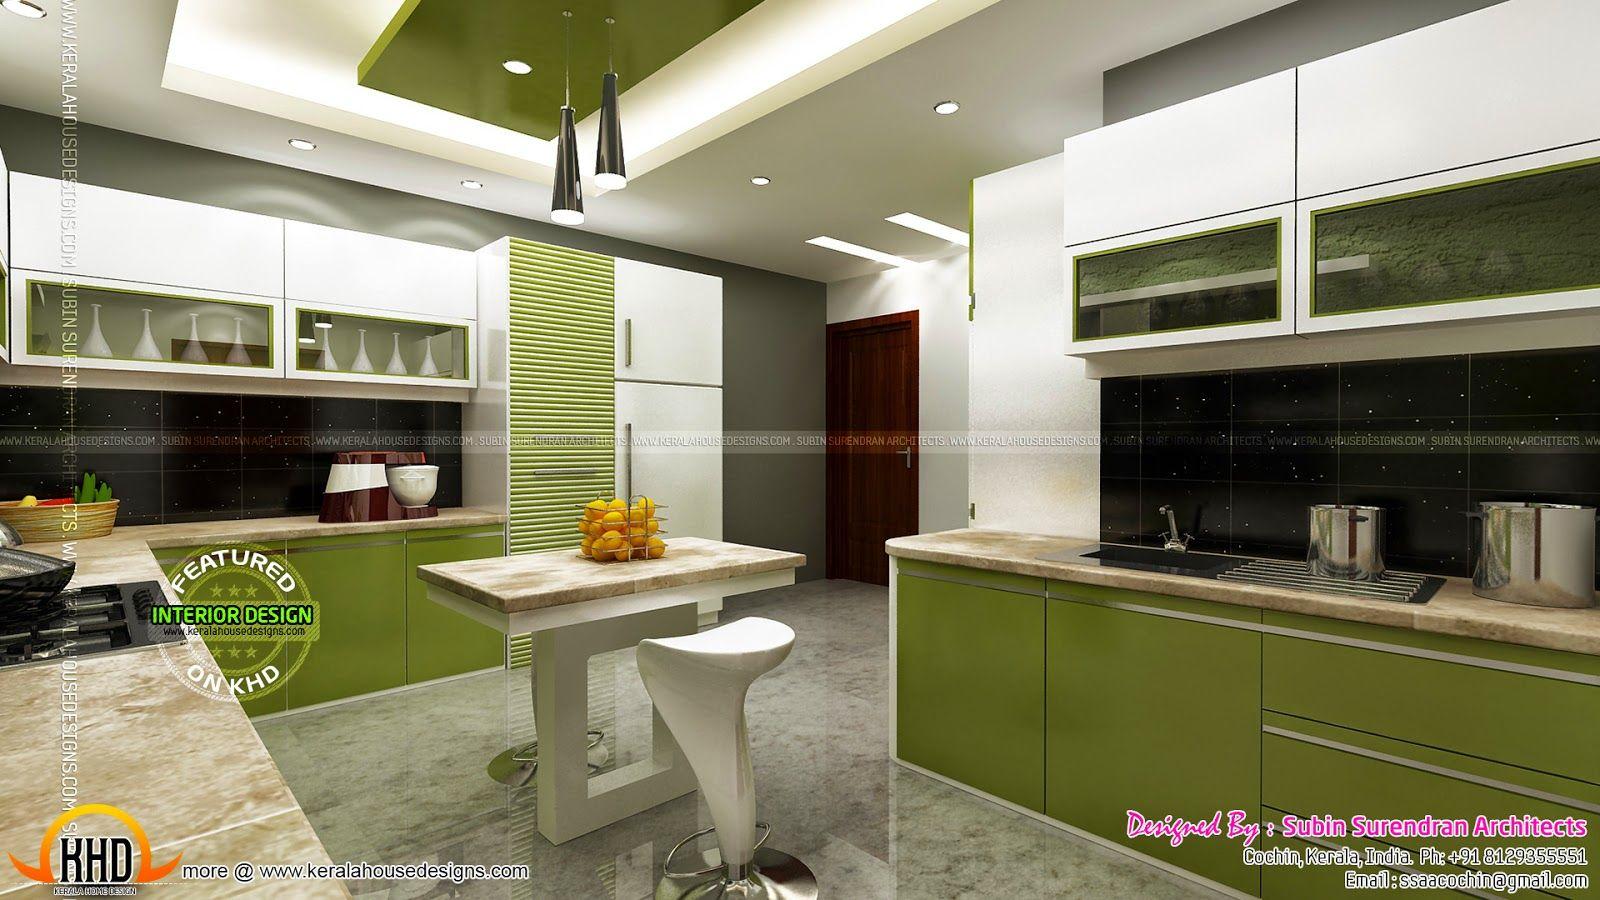 Luxury interior designs kerala home design floor plans kitchen contact house also rh in pinterest